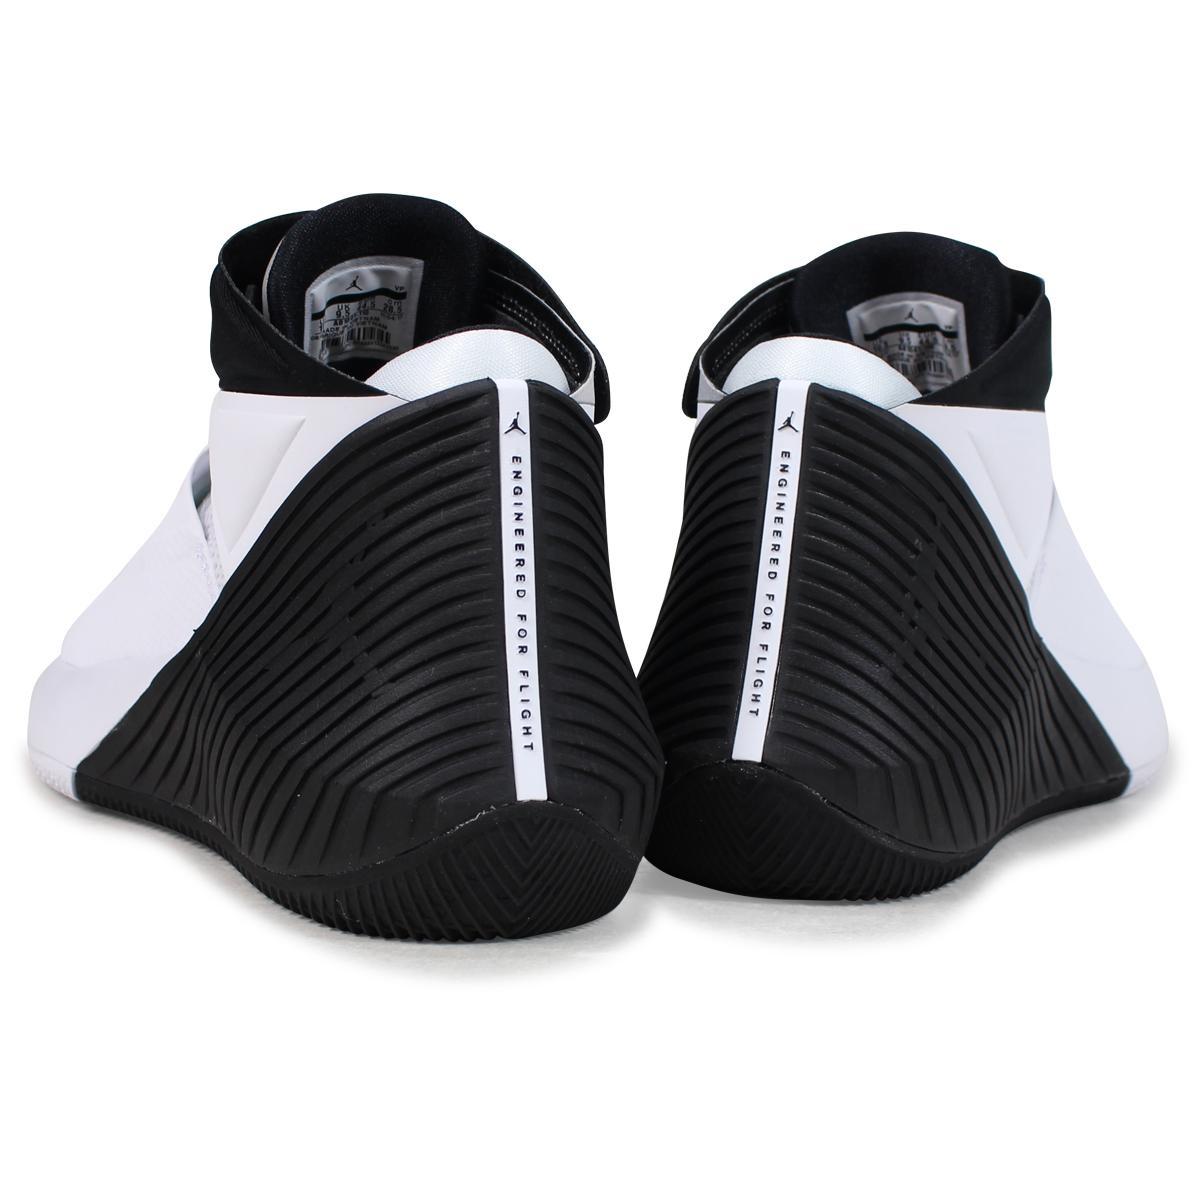 0d550b21ea4 ... NIKE Nike Jordan sneakers men JORDAN WHY NOT ZER0.1 EP AO1041-110 white  ...